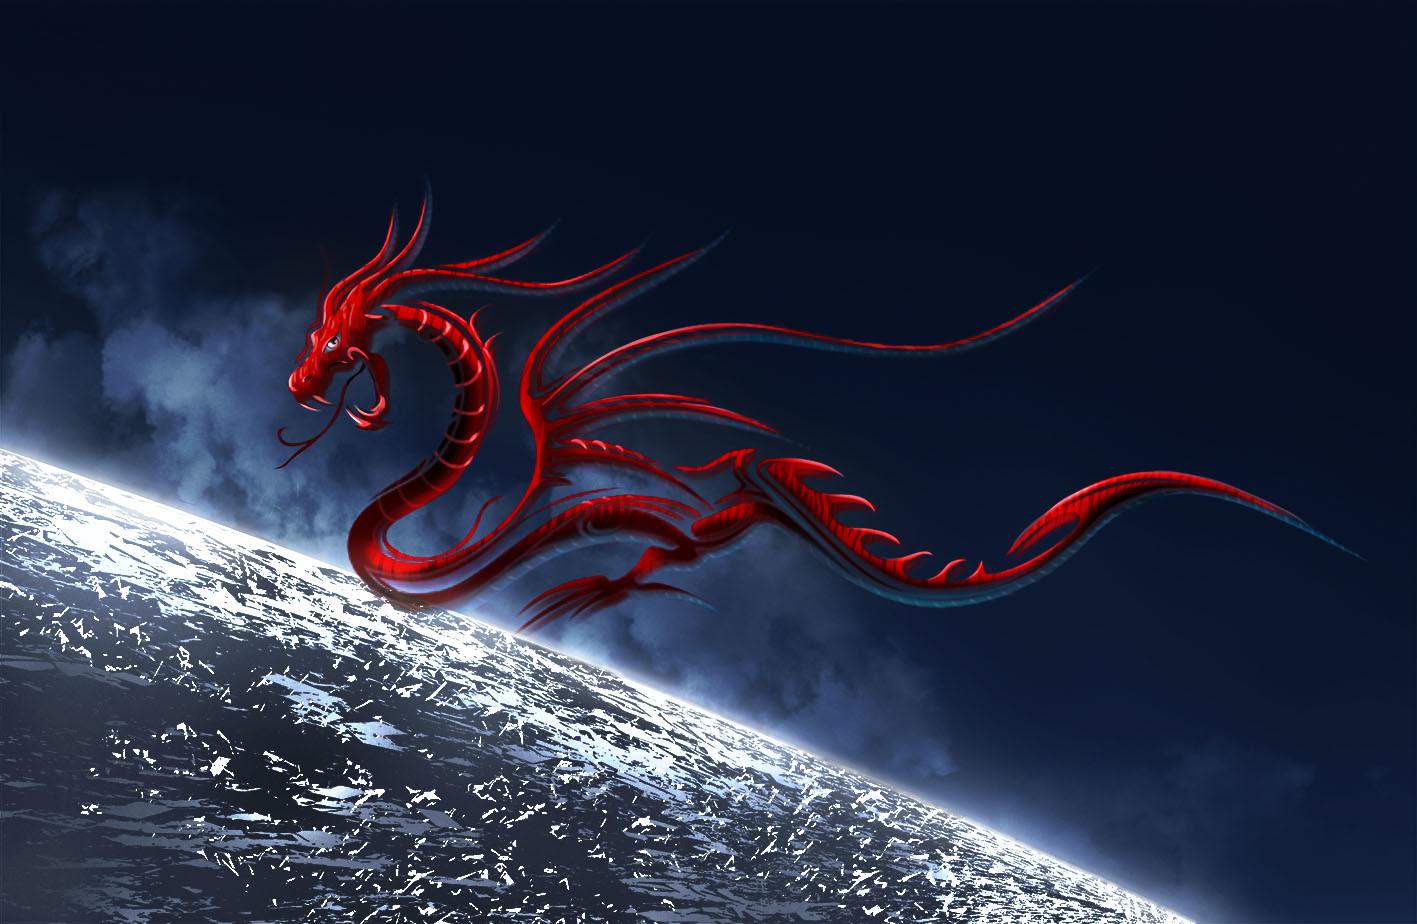 Emrullah cita red dragon